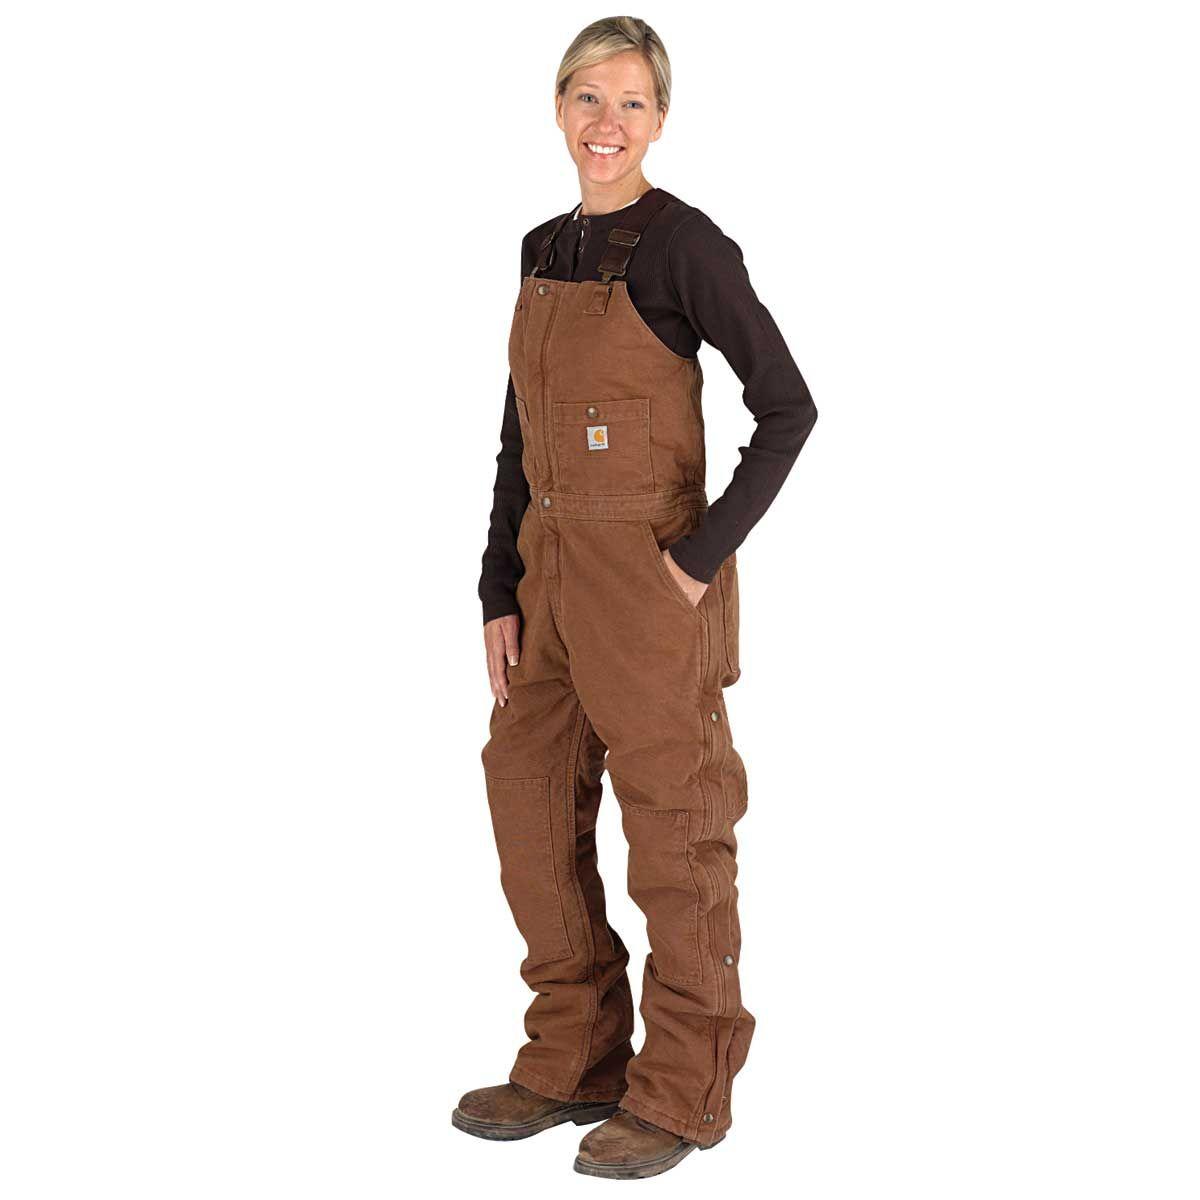 carhartt women s overall carhartt women carhartt on womens insulated bib overalls id=21527